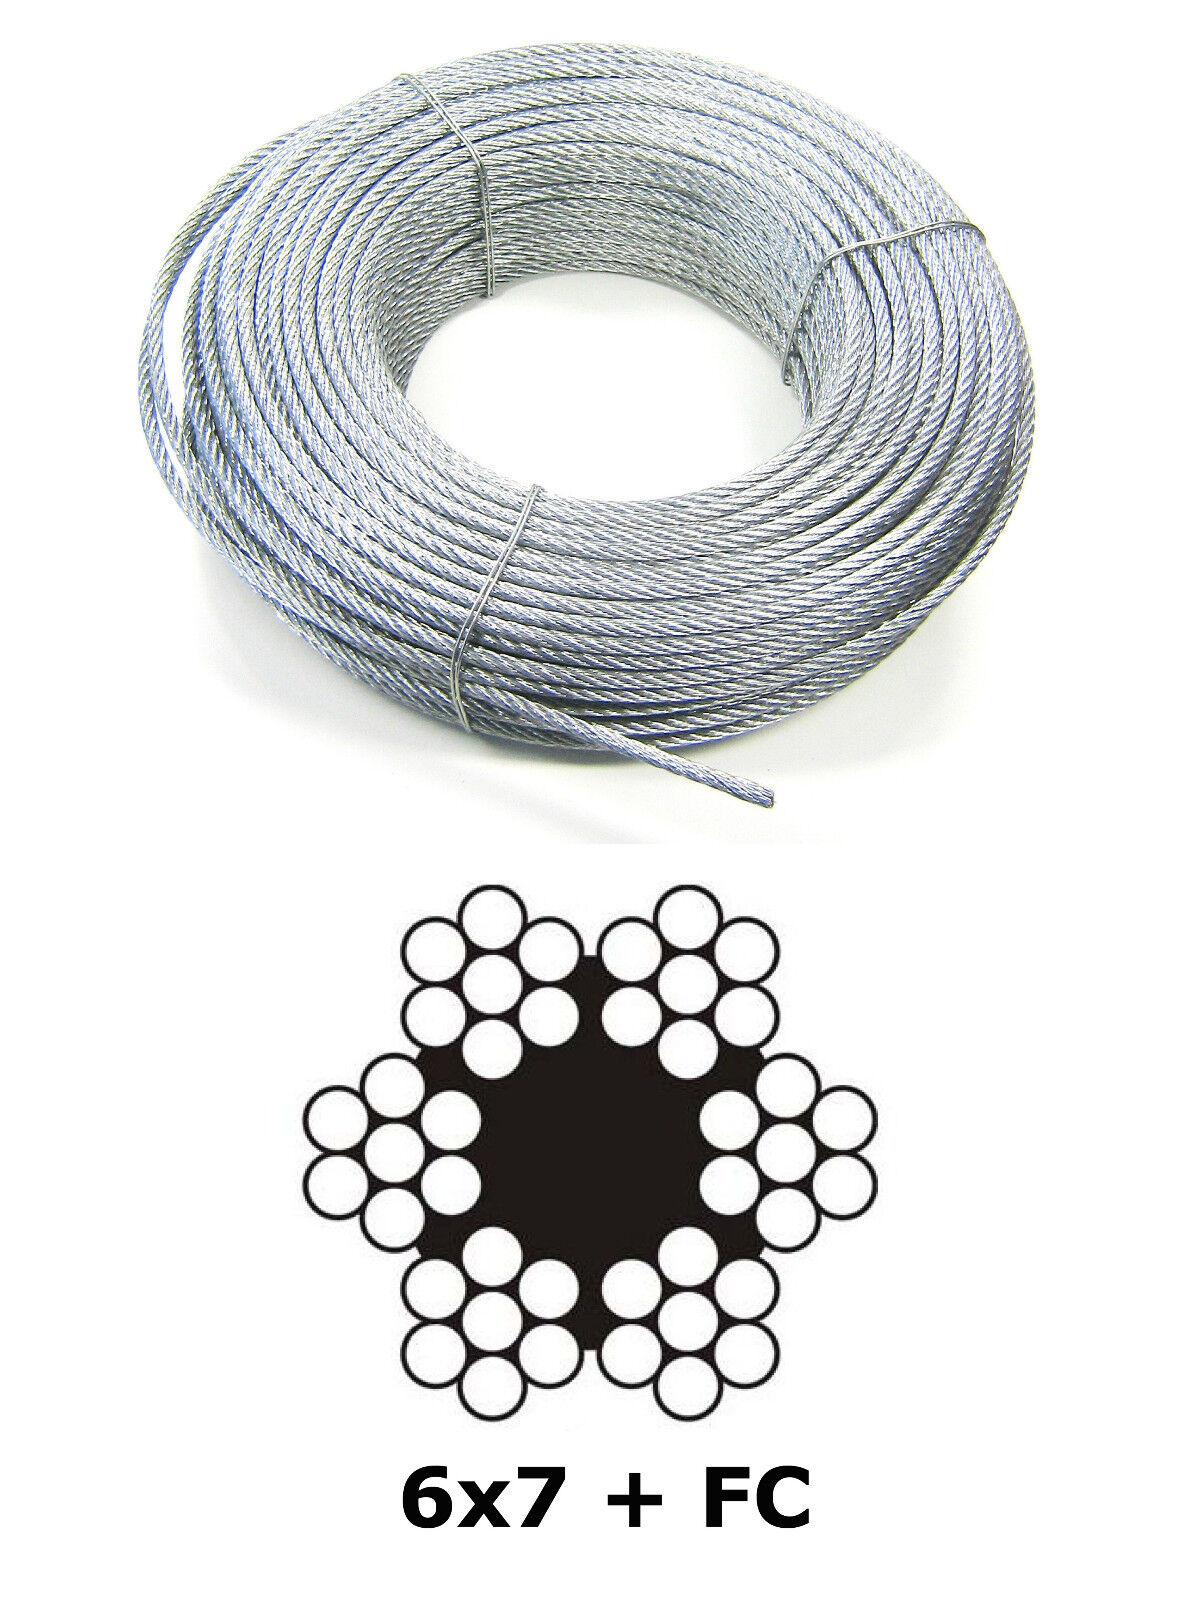 Drahtseil Stahlseil Draht Seile Stahlseile Drahtseile Seil 2-6mm Seil Stahldraht